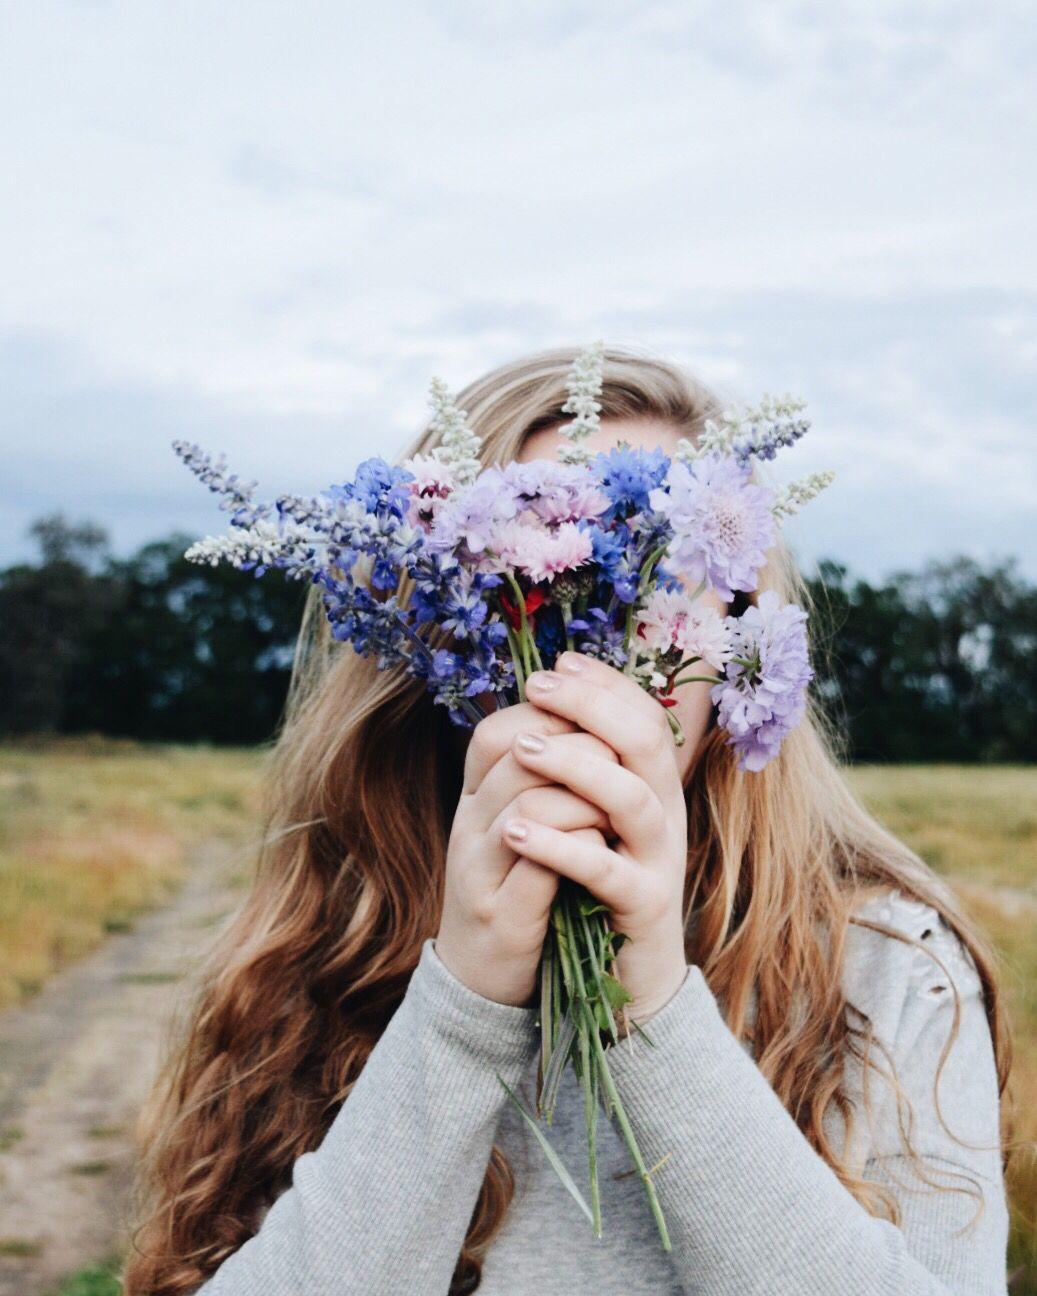 Wildflowers insta wldflowerphoto u pinteresu